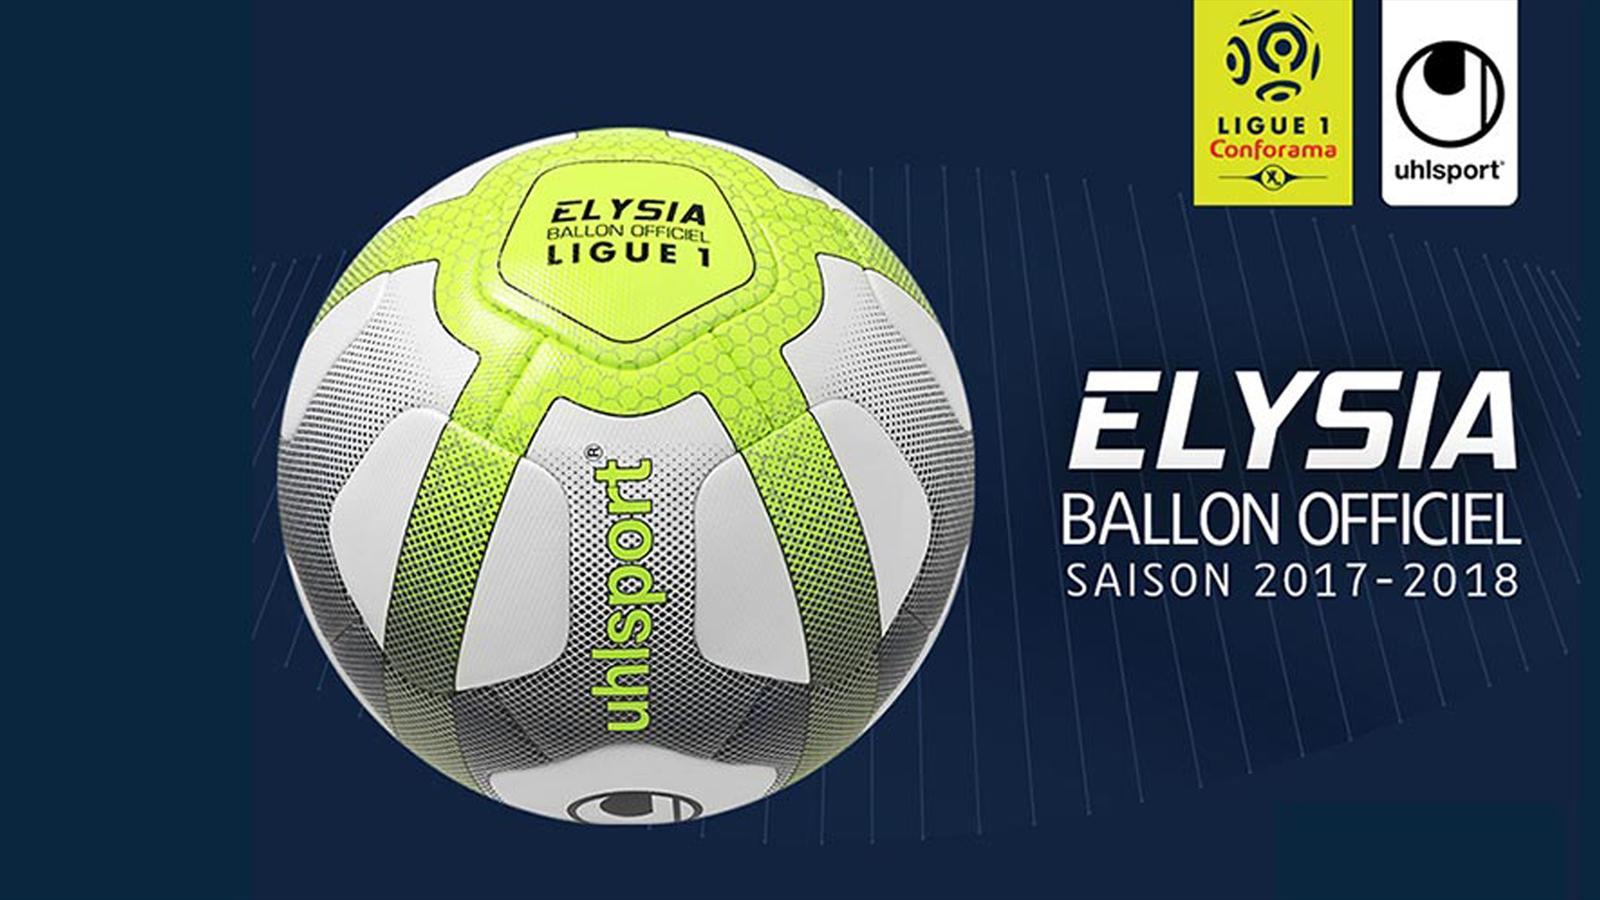 elysia le nouveau ballon officiel de la ligue 1 ligue 1 2016 2017 football eurosport. Black Bedroom Furniture Sets. Home Design Ideas